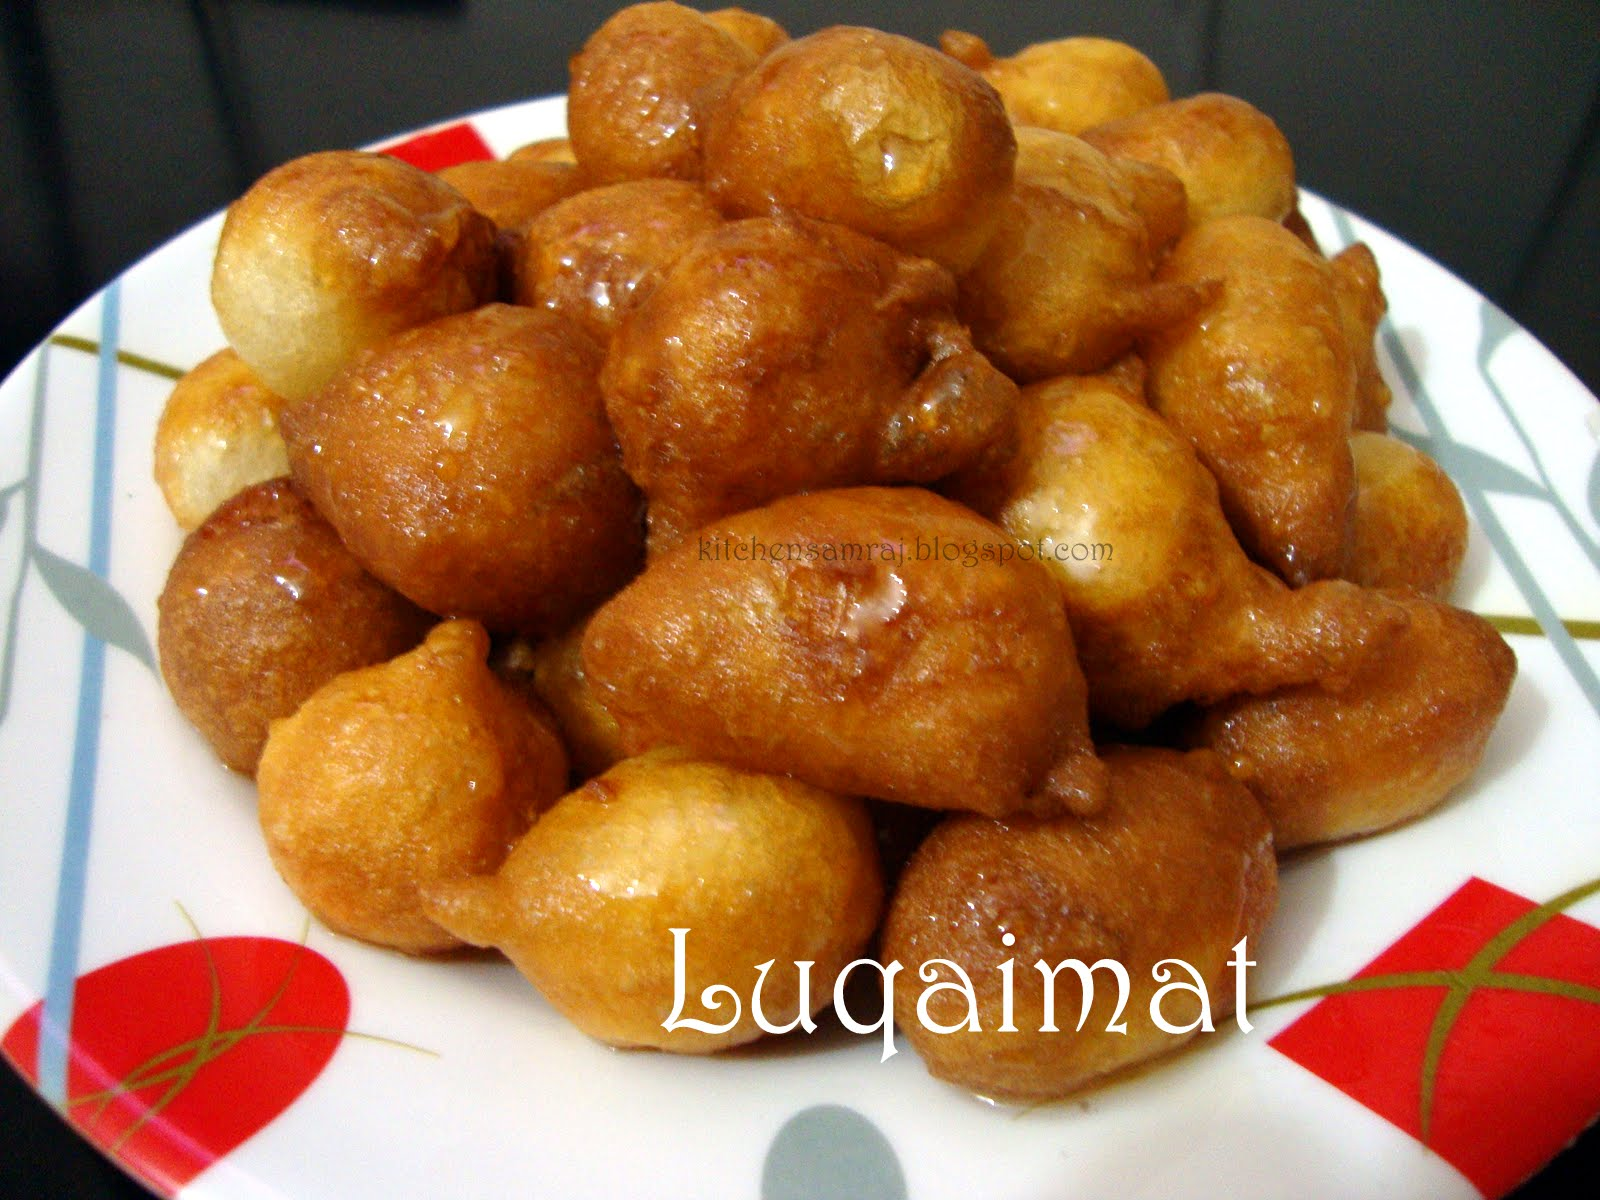 Luqaimat saudi arabian sweet dumplings kitchen samraj Sw meals